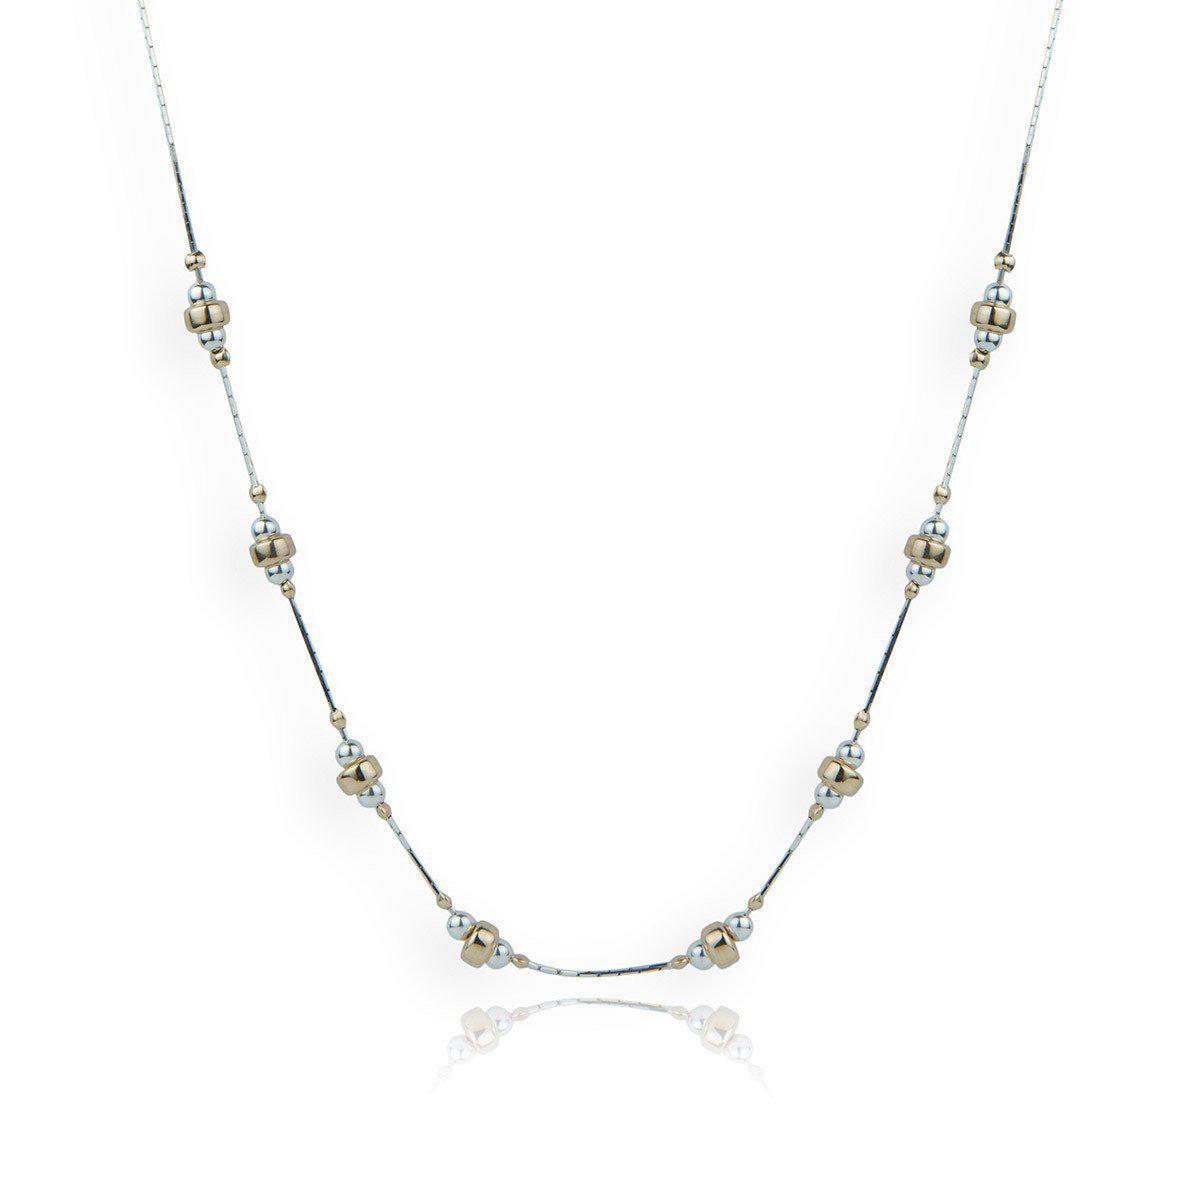 Lavan Gold & Sterling Silver Pebble Necklace - 16 Inches 6WqThbP